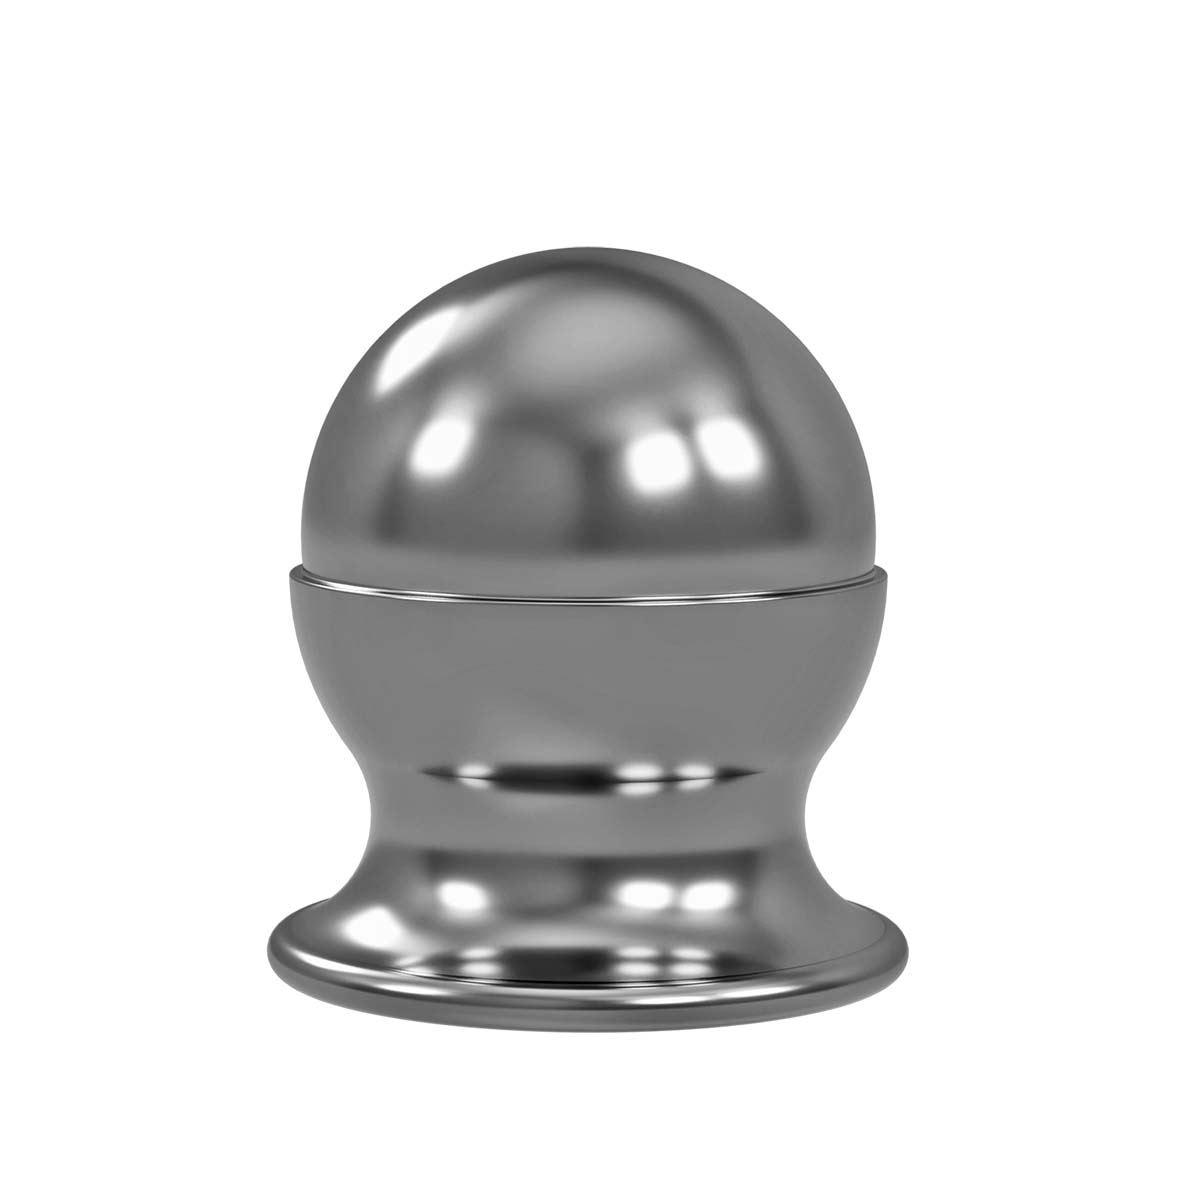 Porta teléfono mobo de ventilador metallic bola no.12  - Sanborns